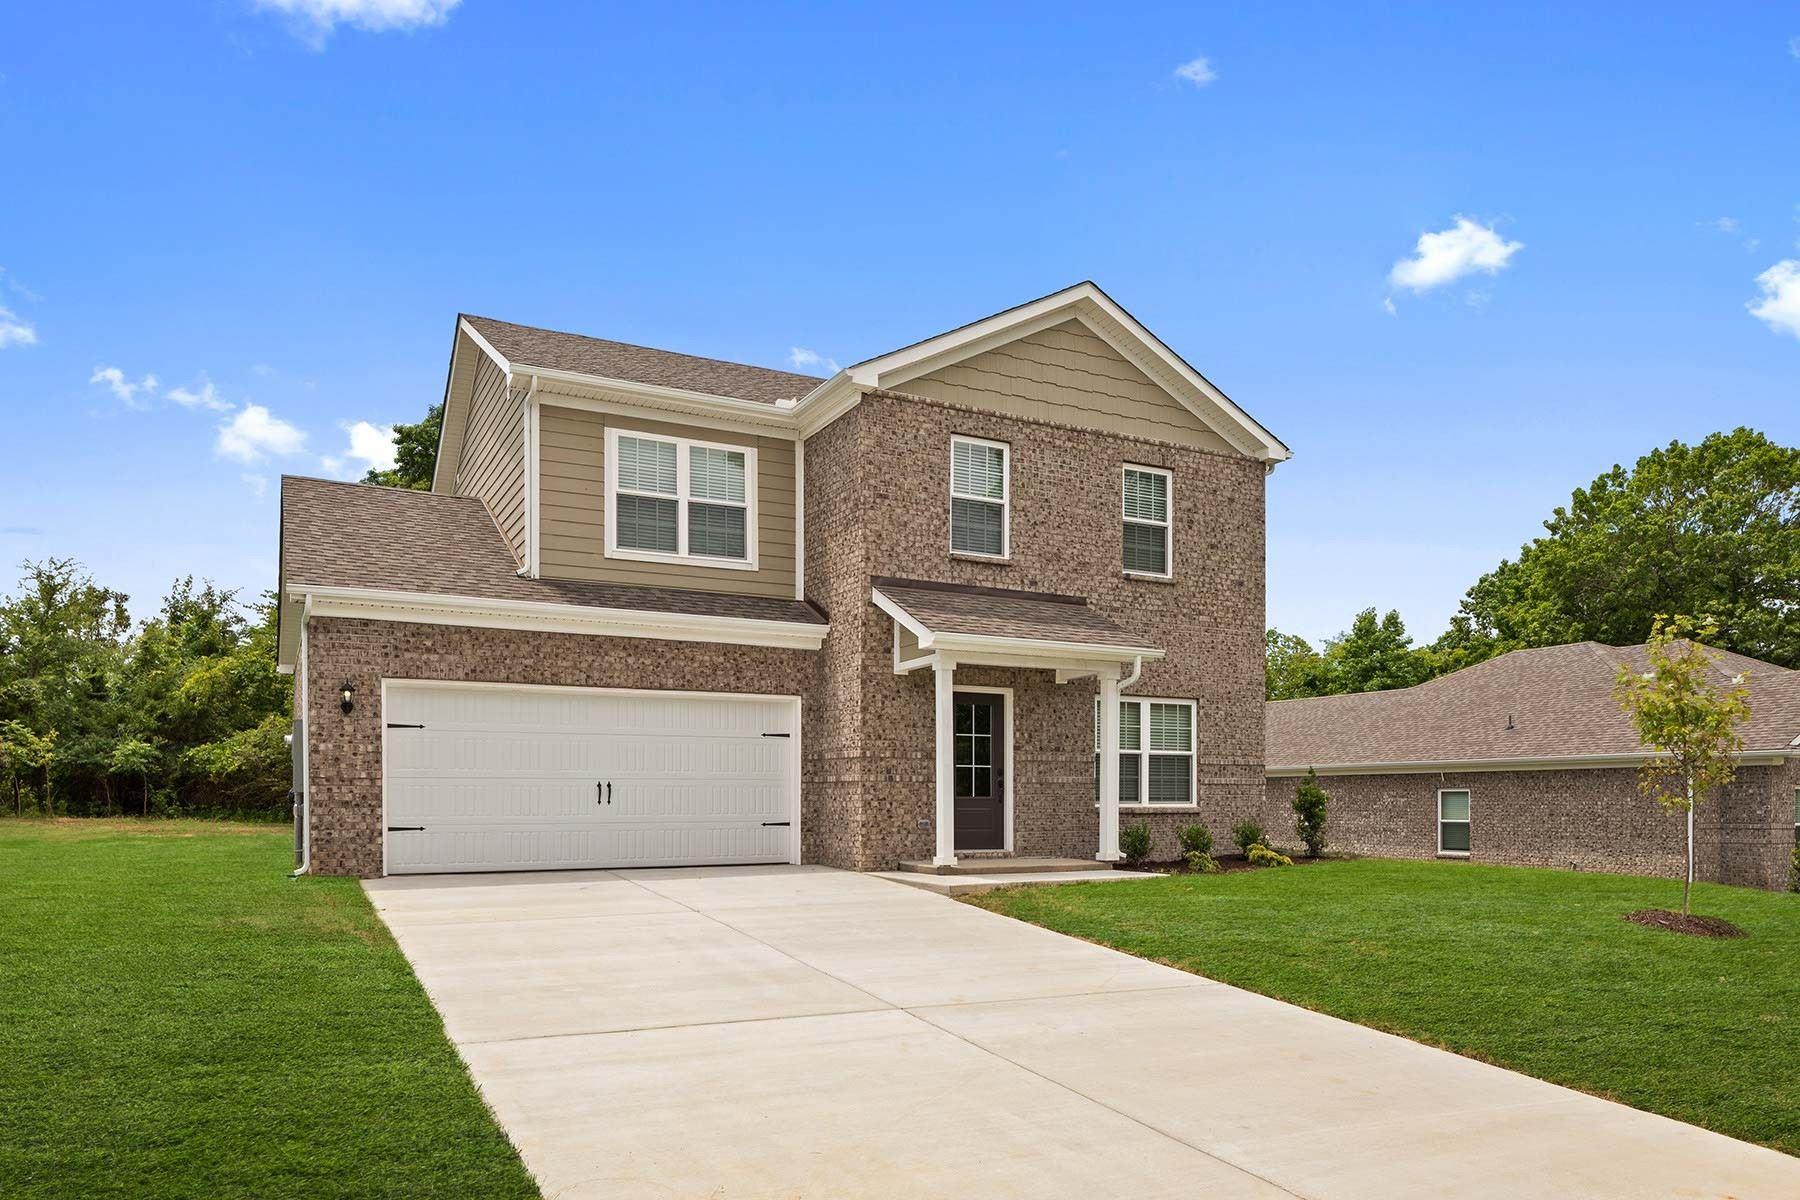 595 Fredericksburg Dr, Gallatin, TN 37066 - MLS#: 2179856